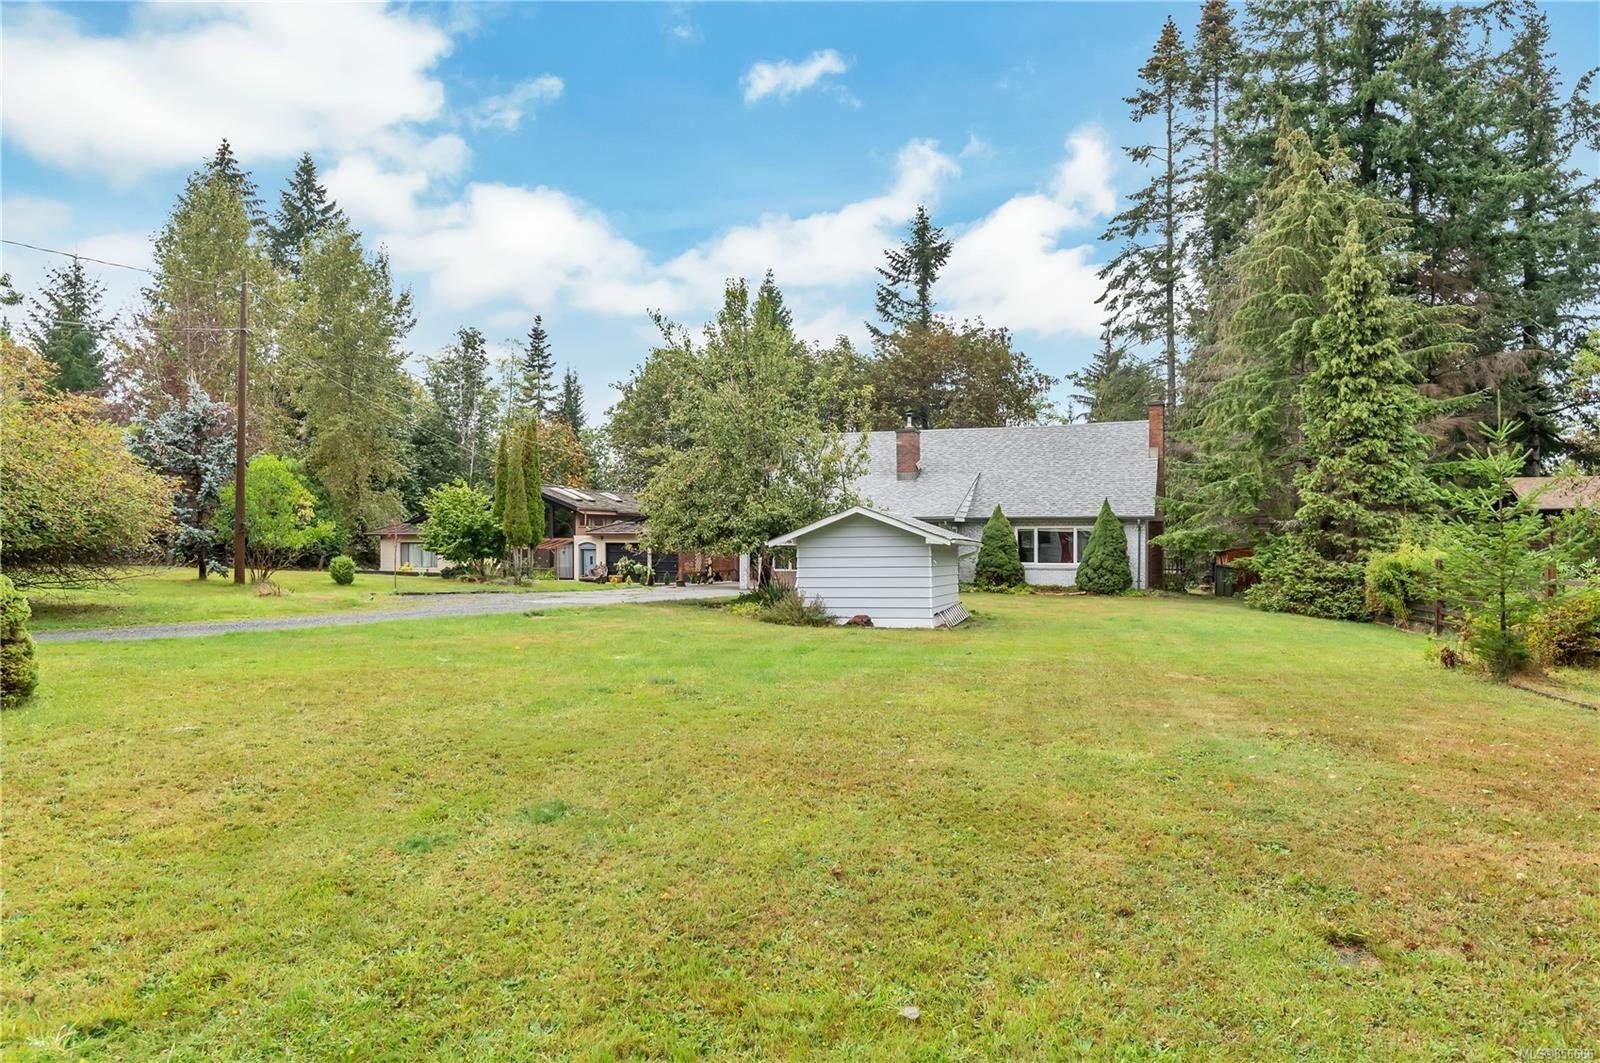 Photo 45: Photos: 2468 Oakes Rd in : CV Merville Black Creek House for sale (Comox Valley)  : MLS®# 856666